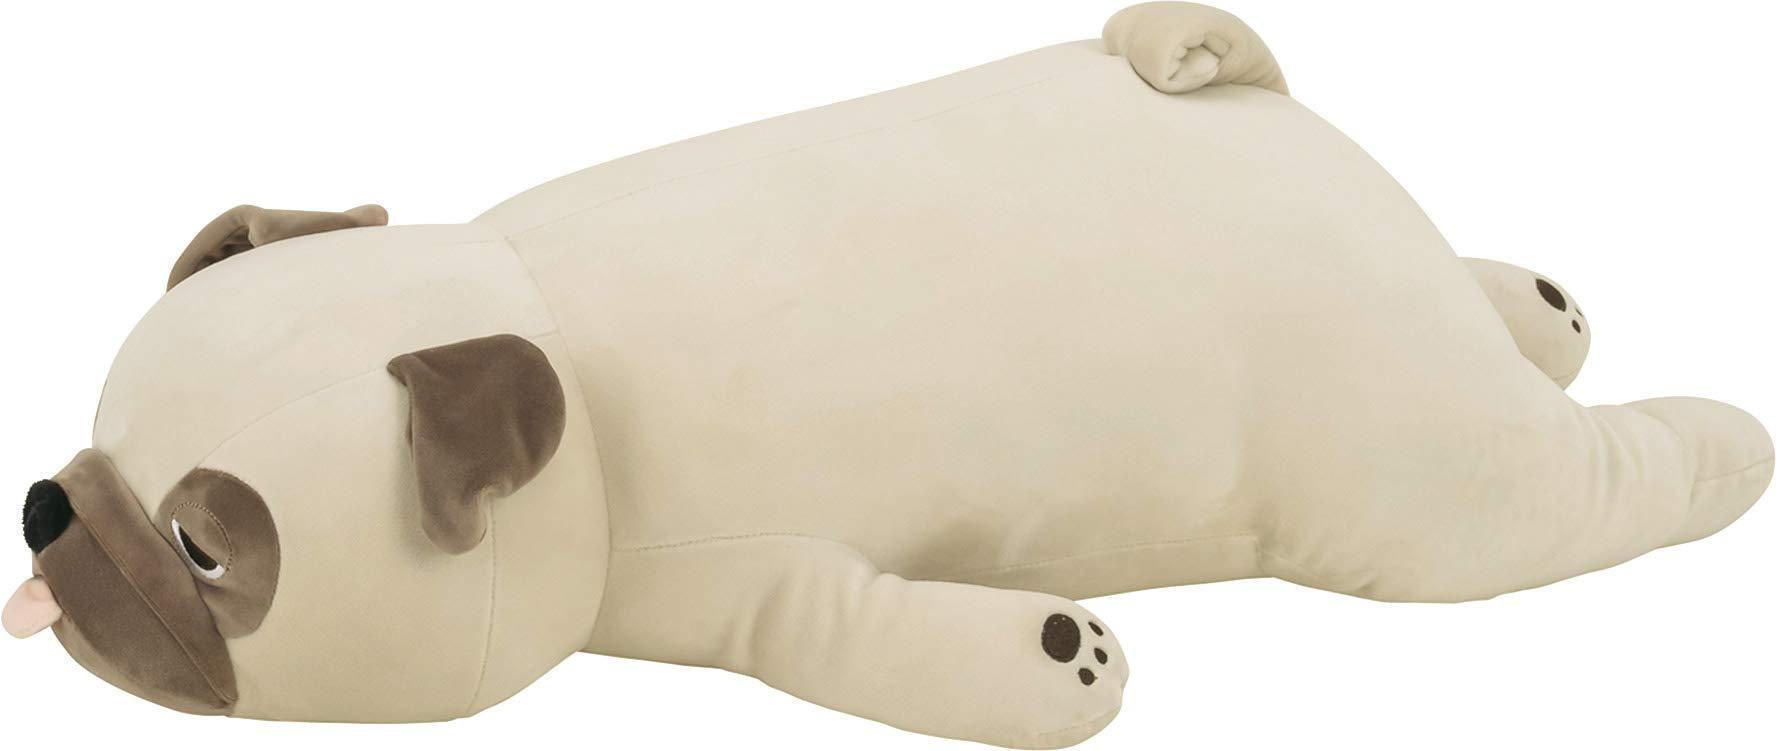 LivHeart Premium Nemu Nemu Sleepy head Animals Body Pillow Beige Plush Dog Pug 'Hana' size M (22''x9''x5'') Japan import 48769-32 Huggable Super Soft Stuffed Toy by LIV HEART